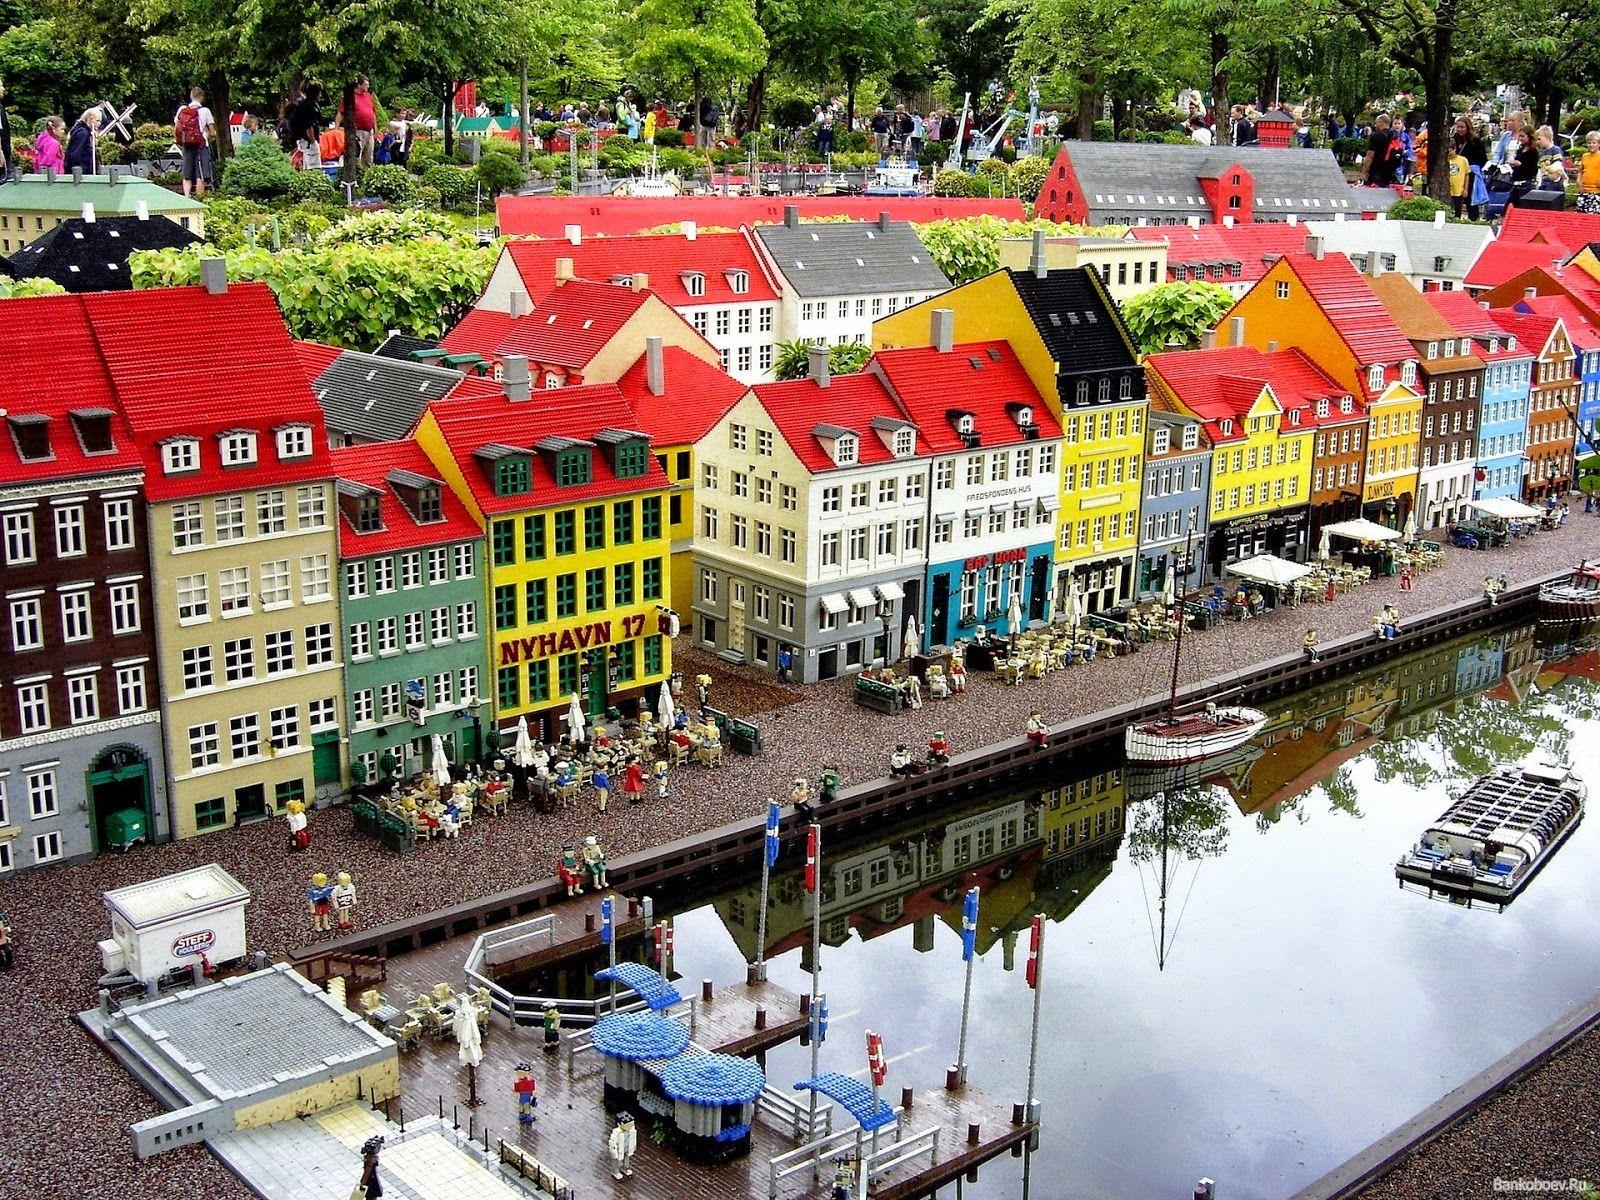 Legoland Billund (Billund Denmark) Legoland, Denmark